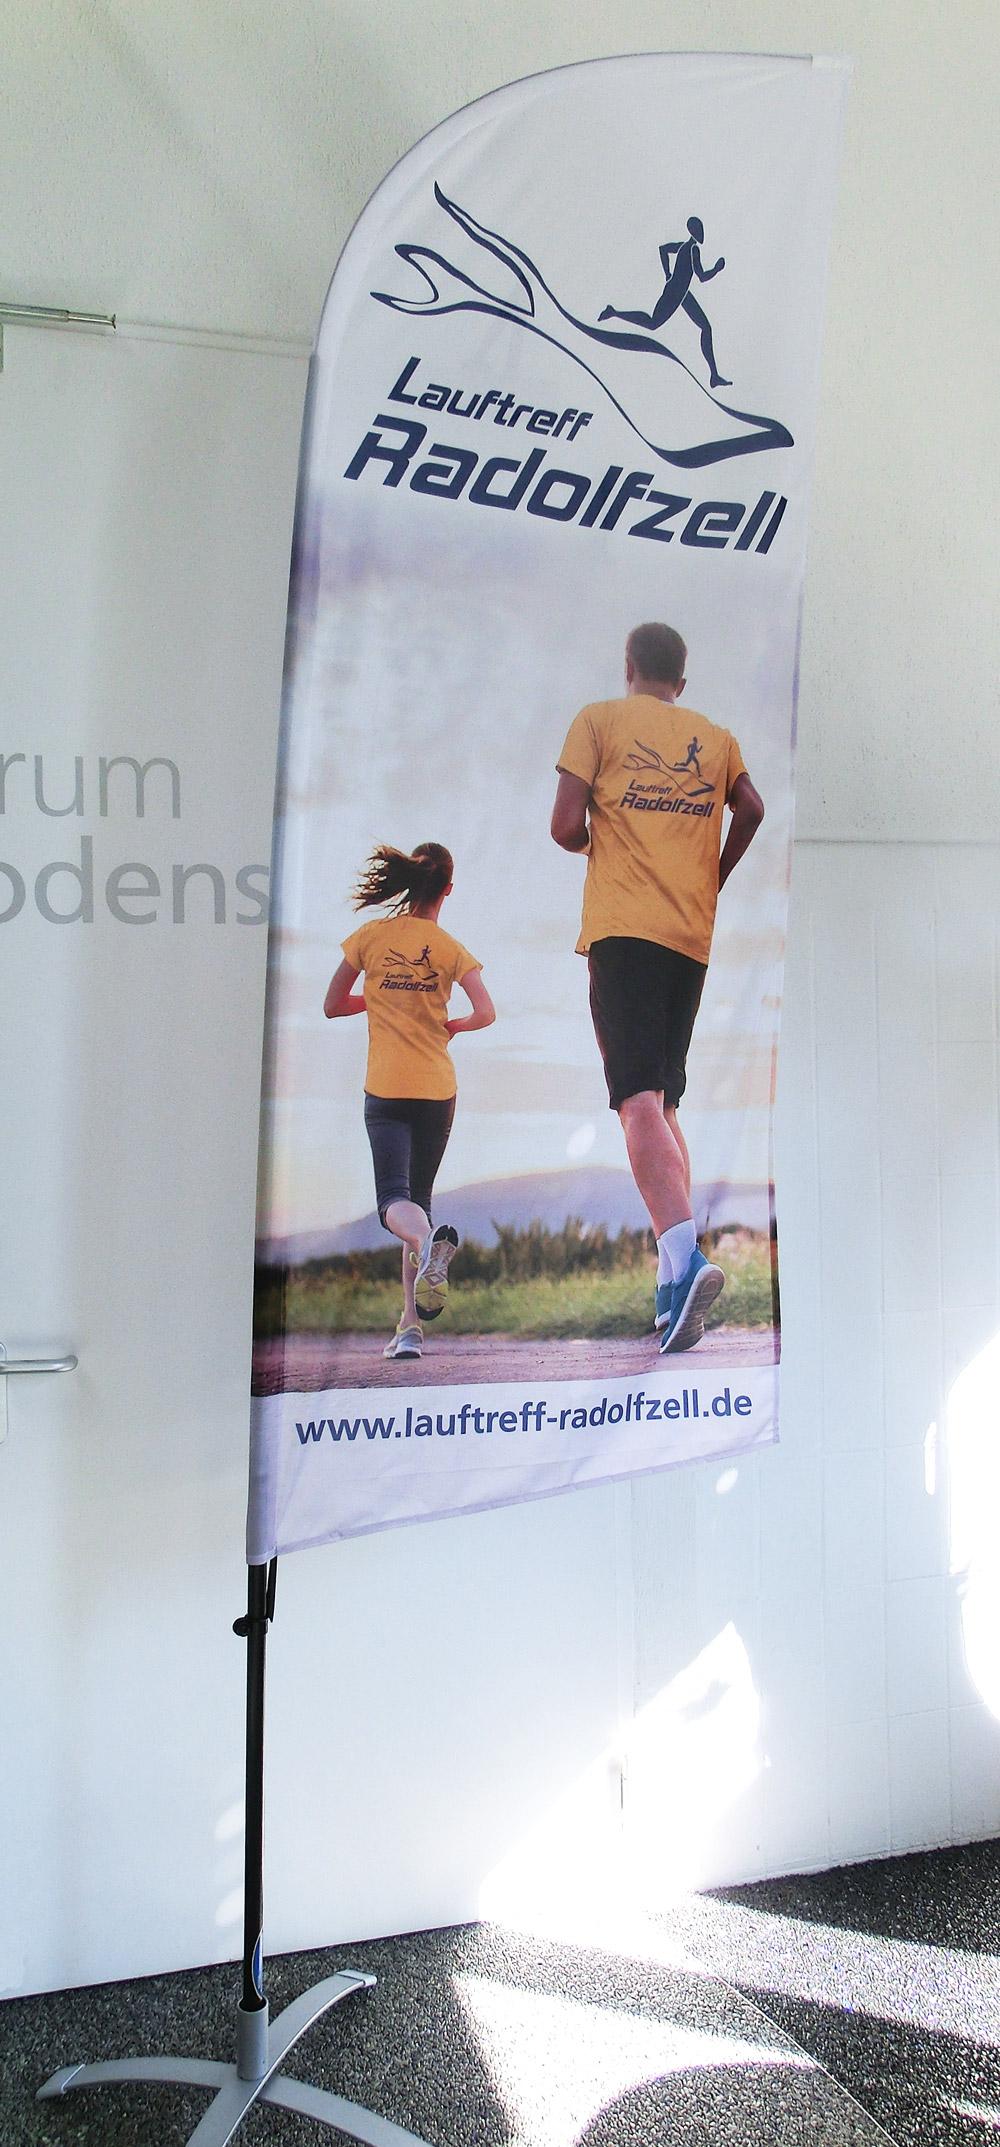 Beachflag Lauftreff Radolfzell